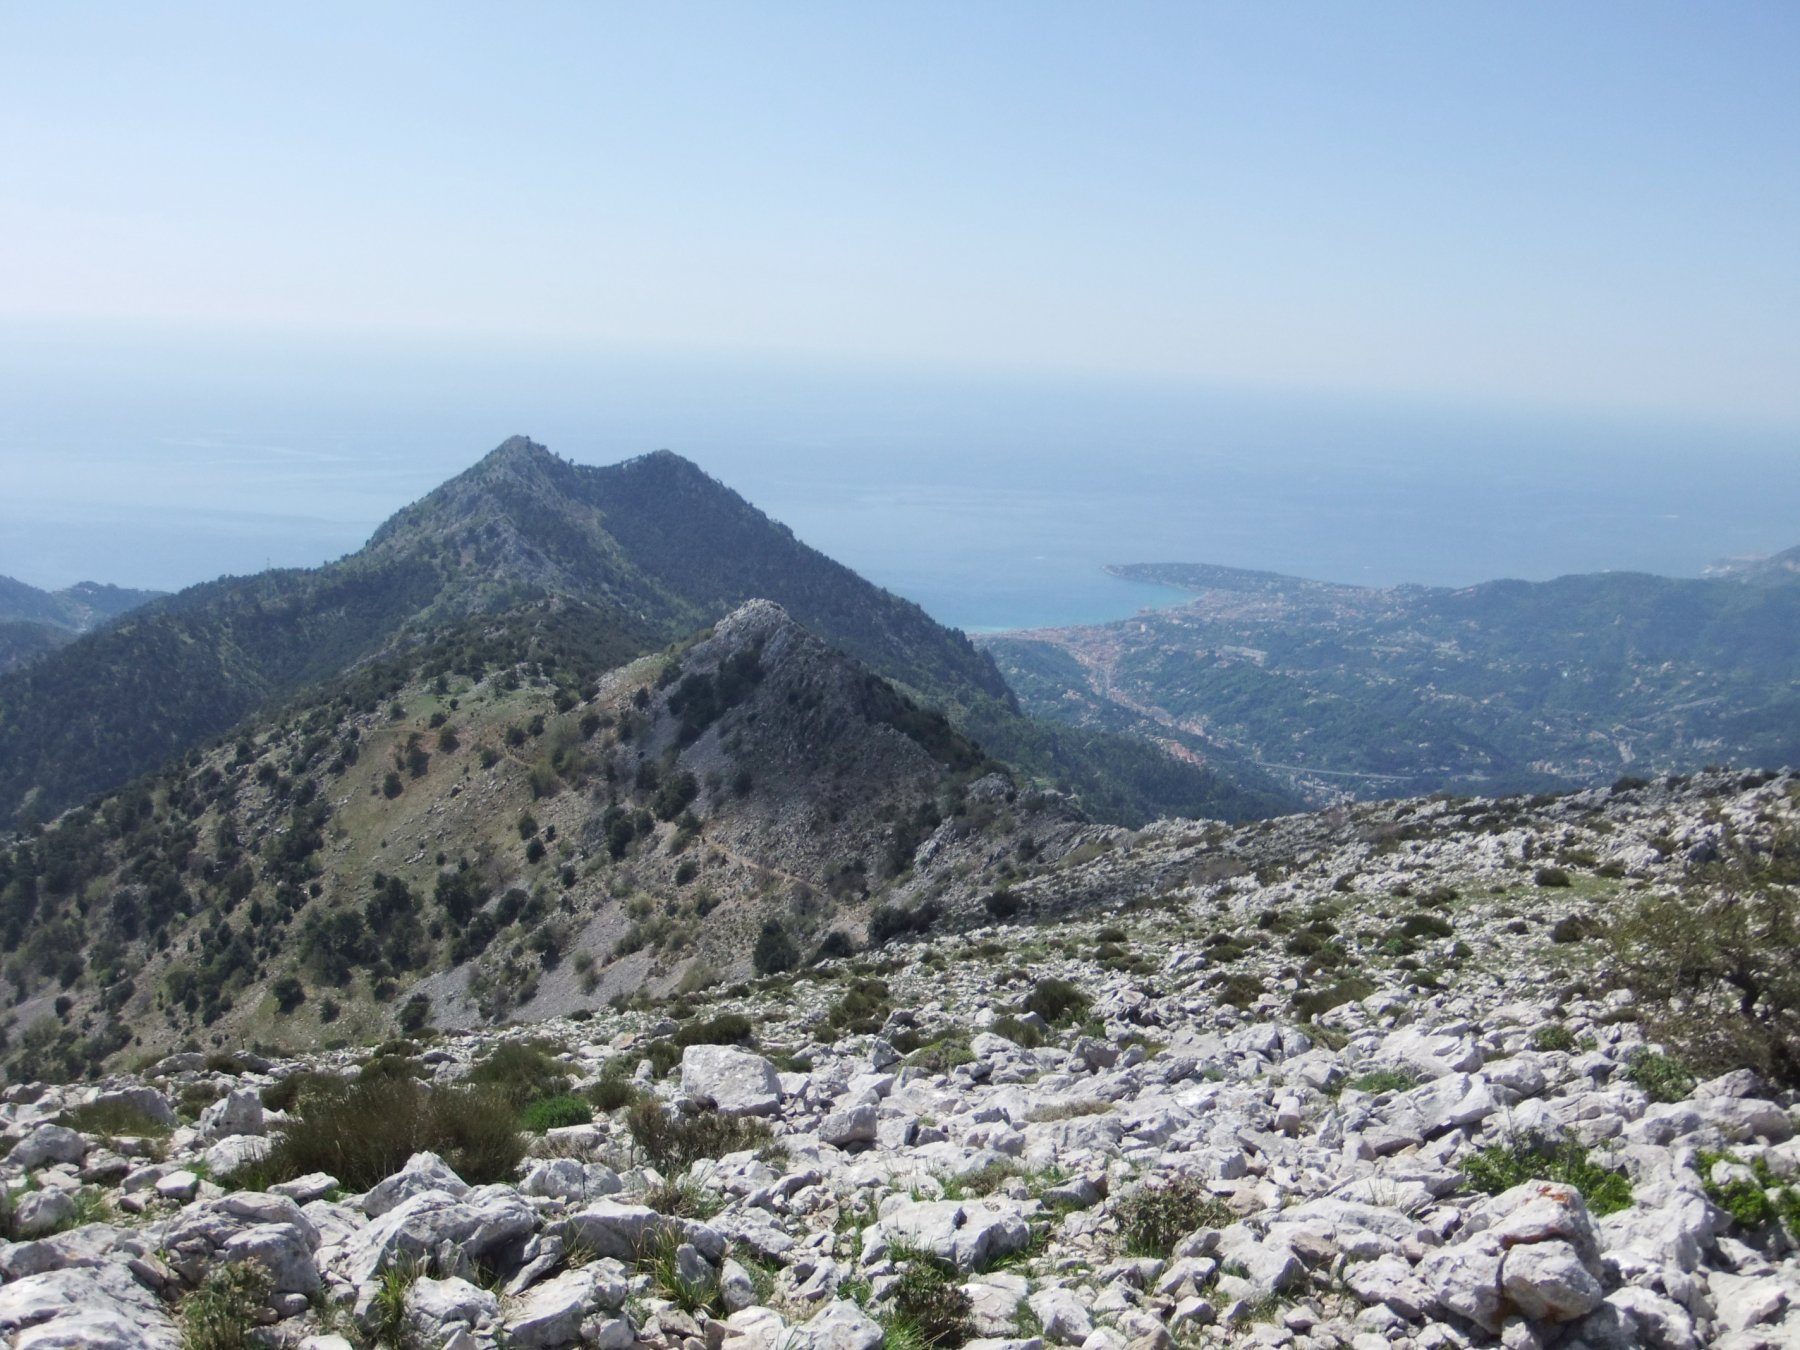 Grammondo (Monte) da Calvo 2020-04-13